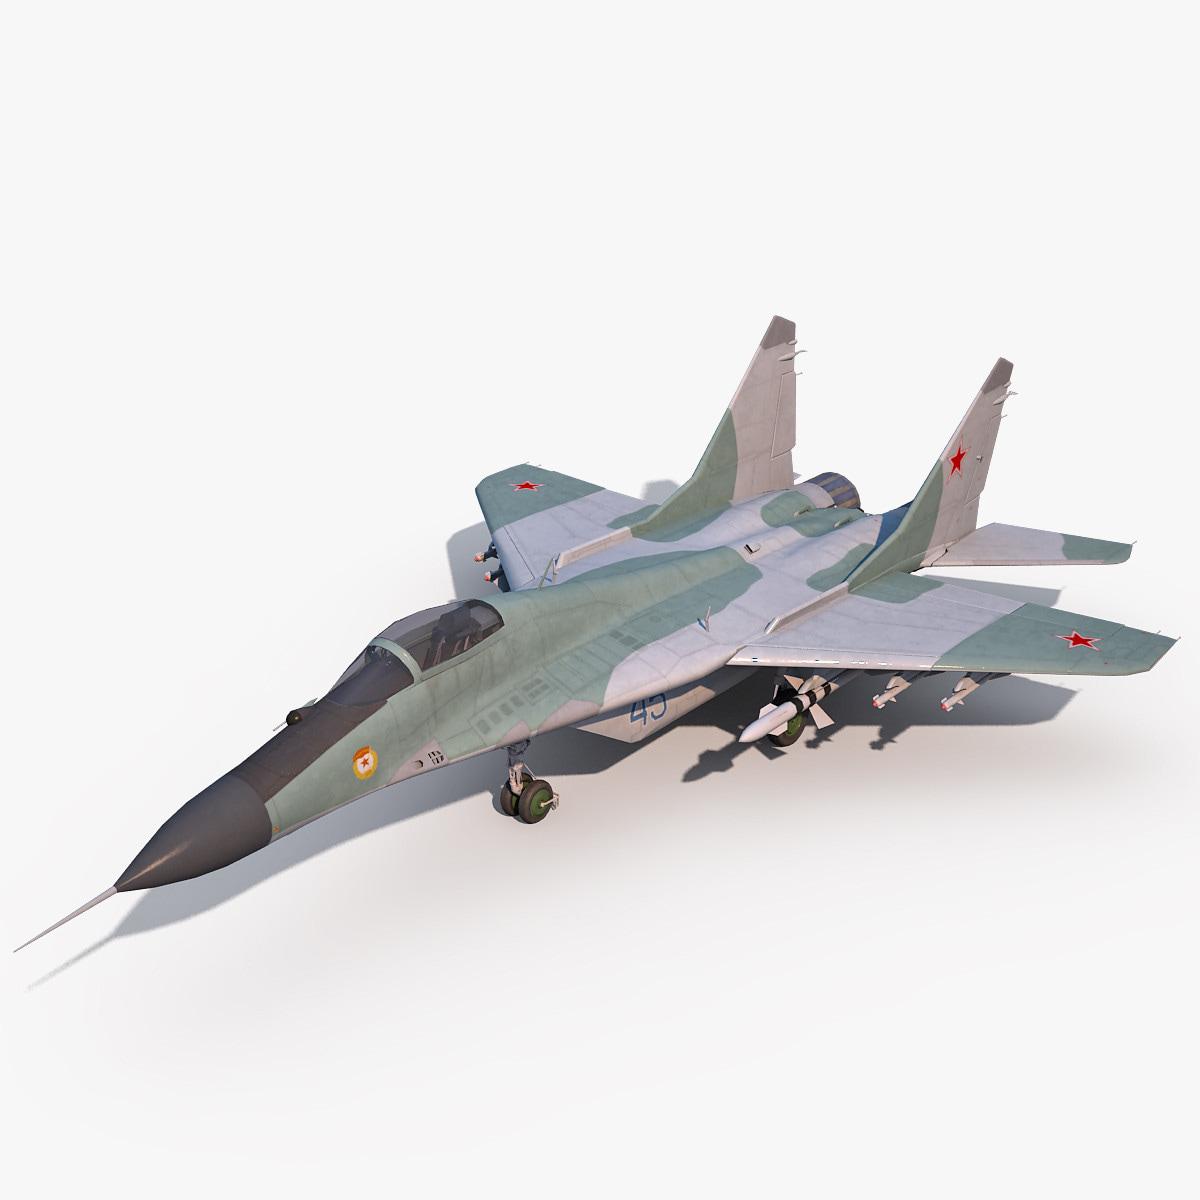 MiG_29SMT_012.jpg38cc4e30-195c-4e71-9e6f-9d57d7fde5c3Original.jpg